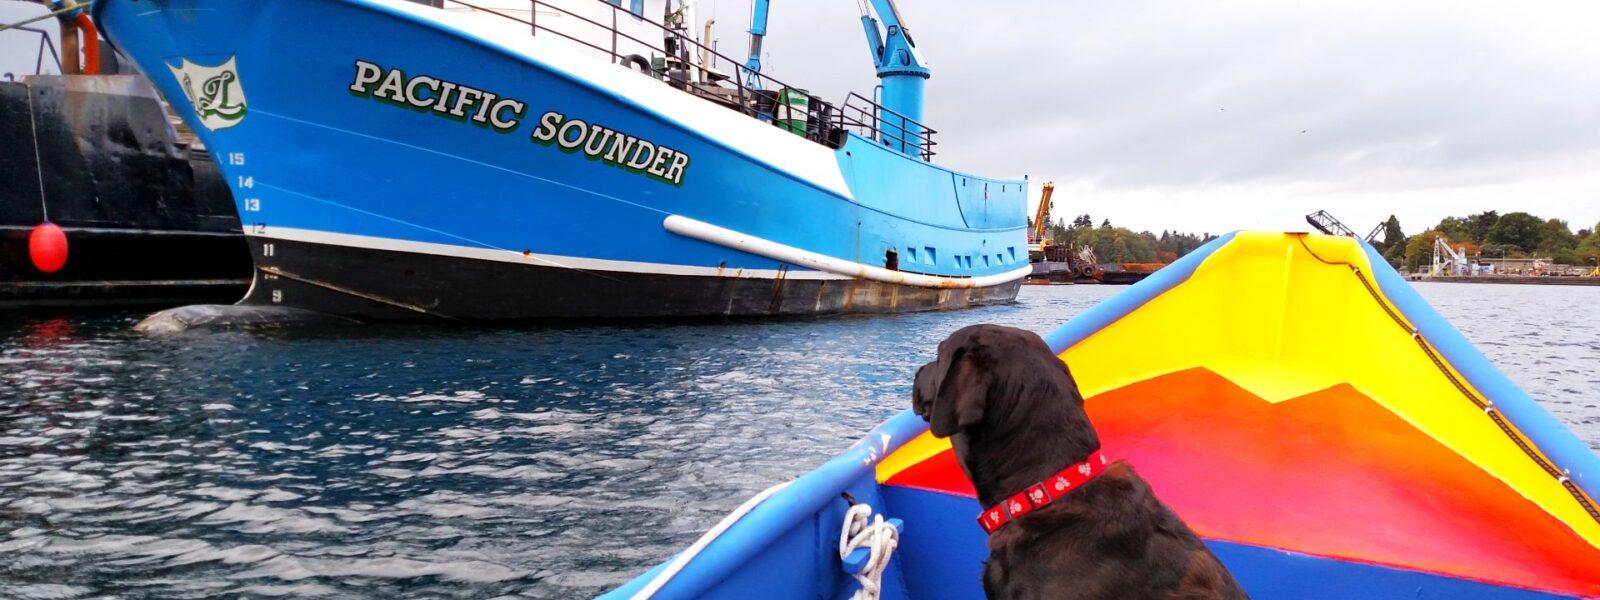 Seattle Easter Boat Parade, Salty Dog Boating, NW Yachting, NW Sailing, Shilshole Bay, Salty Dog Boating